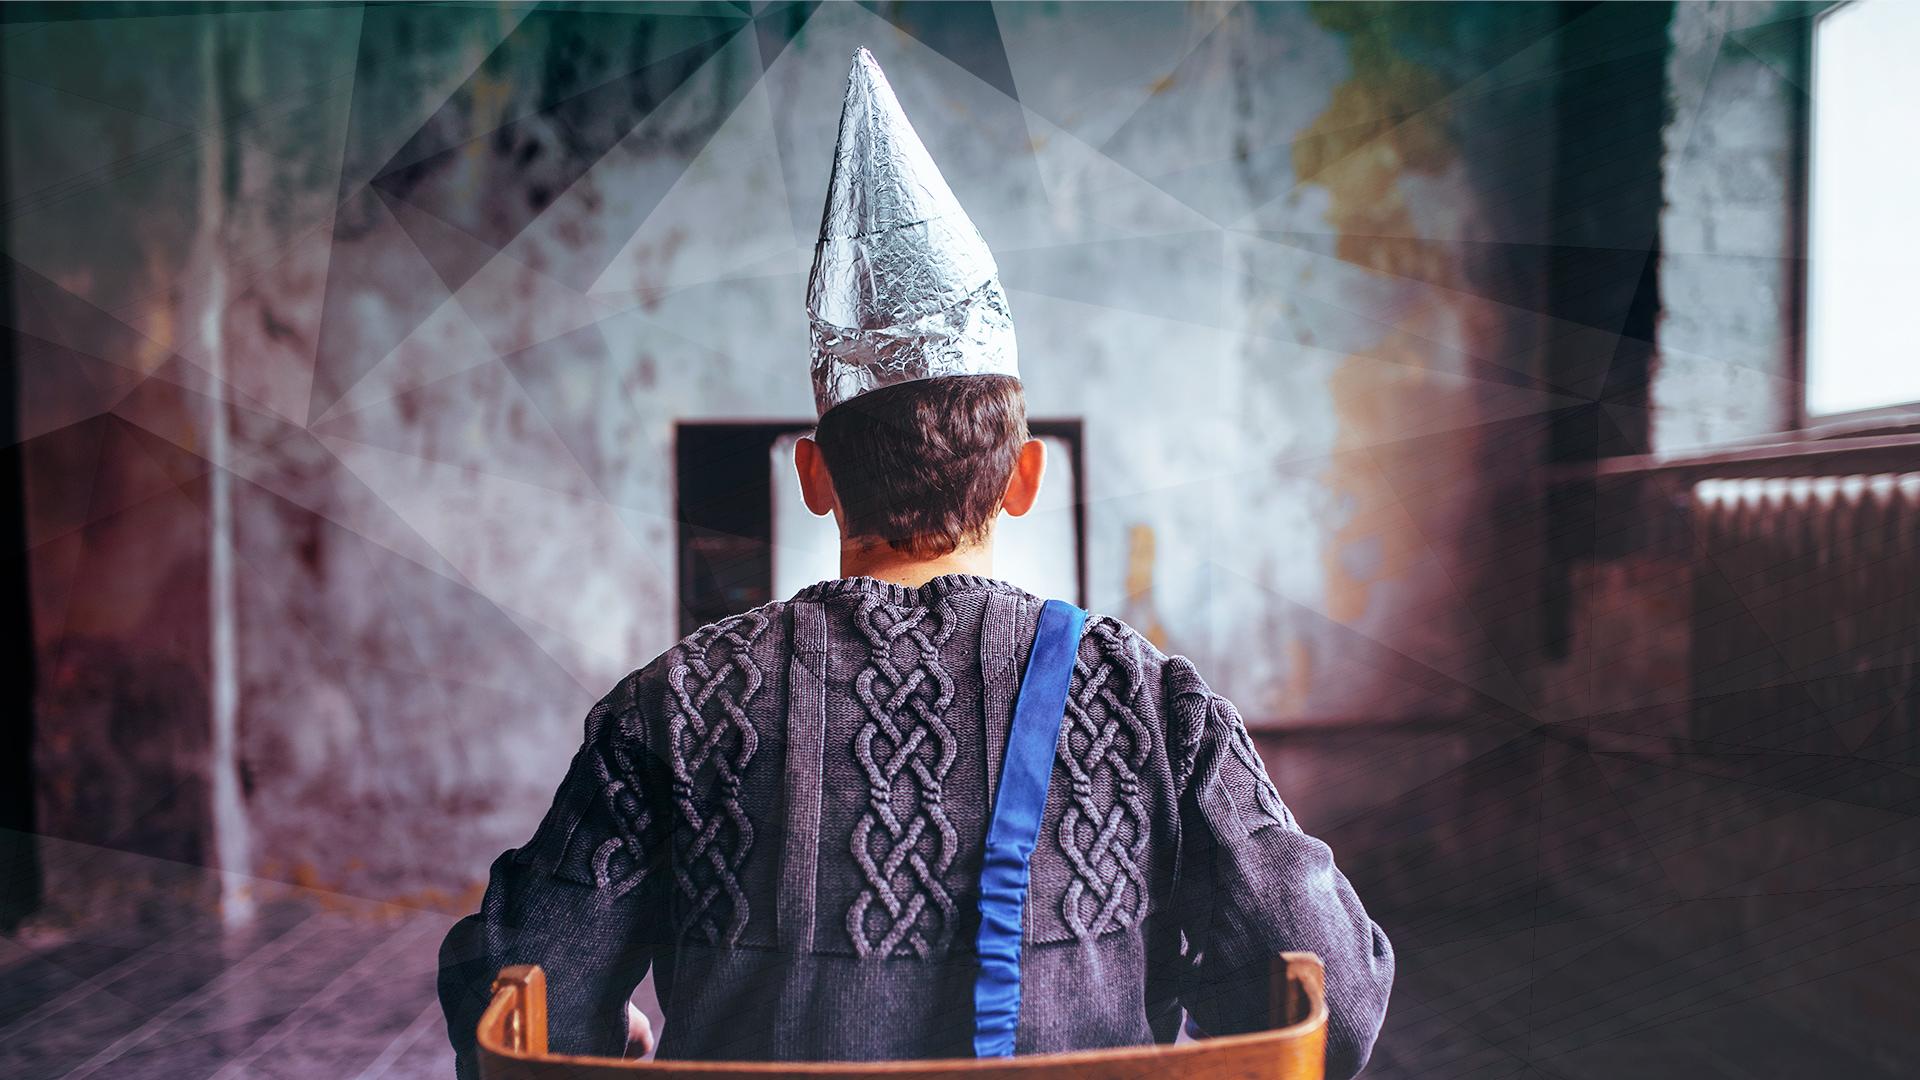 Aluminium, Verschwörungstheorien, Verschwörung, Verschwörungstheoretiker, Angst, Aluhut, Aluminiumfolien-Hut, Stanniolhut